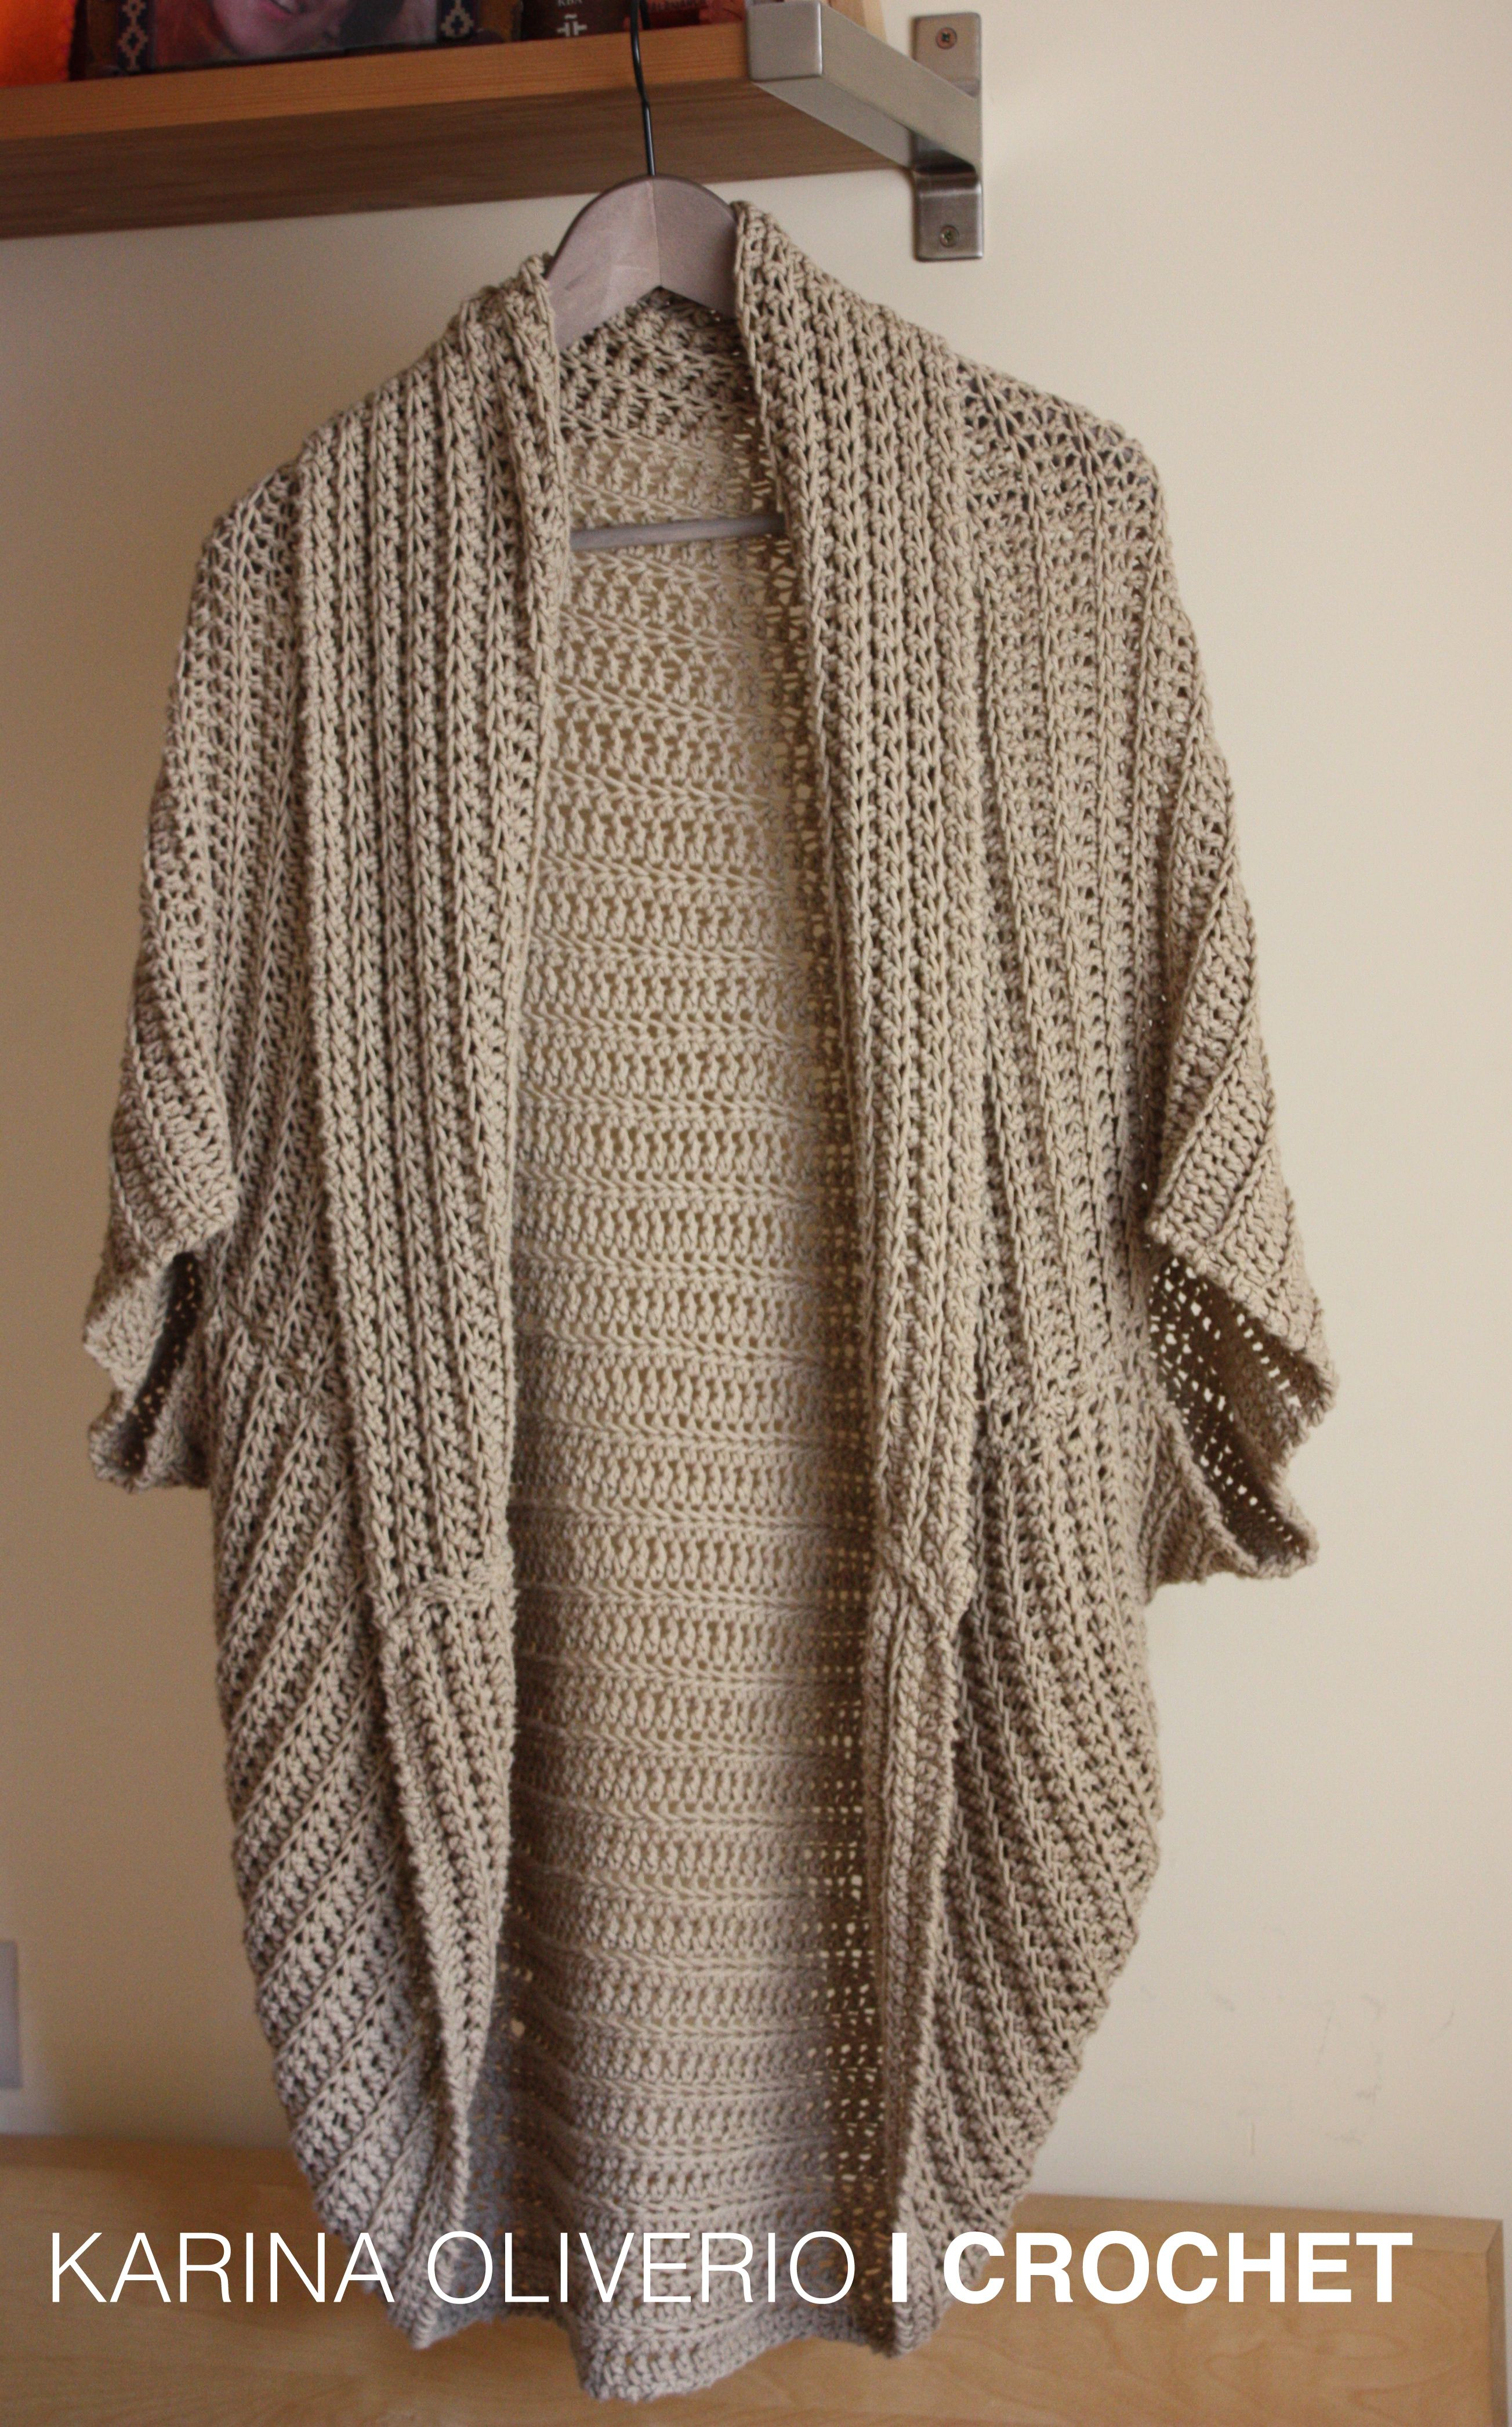 Crochet shrug pattern, bolero tejido a crochet con patrón. | Crochet ...